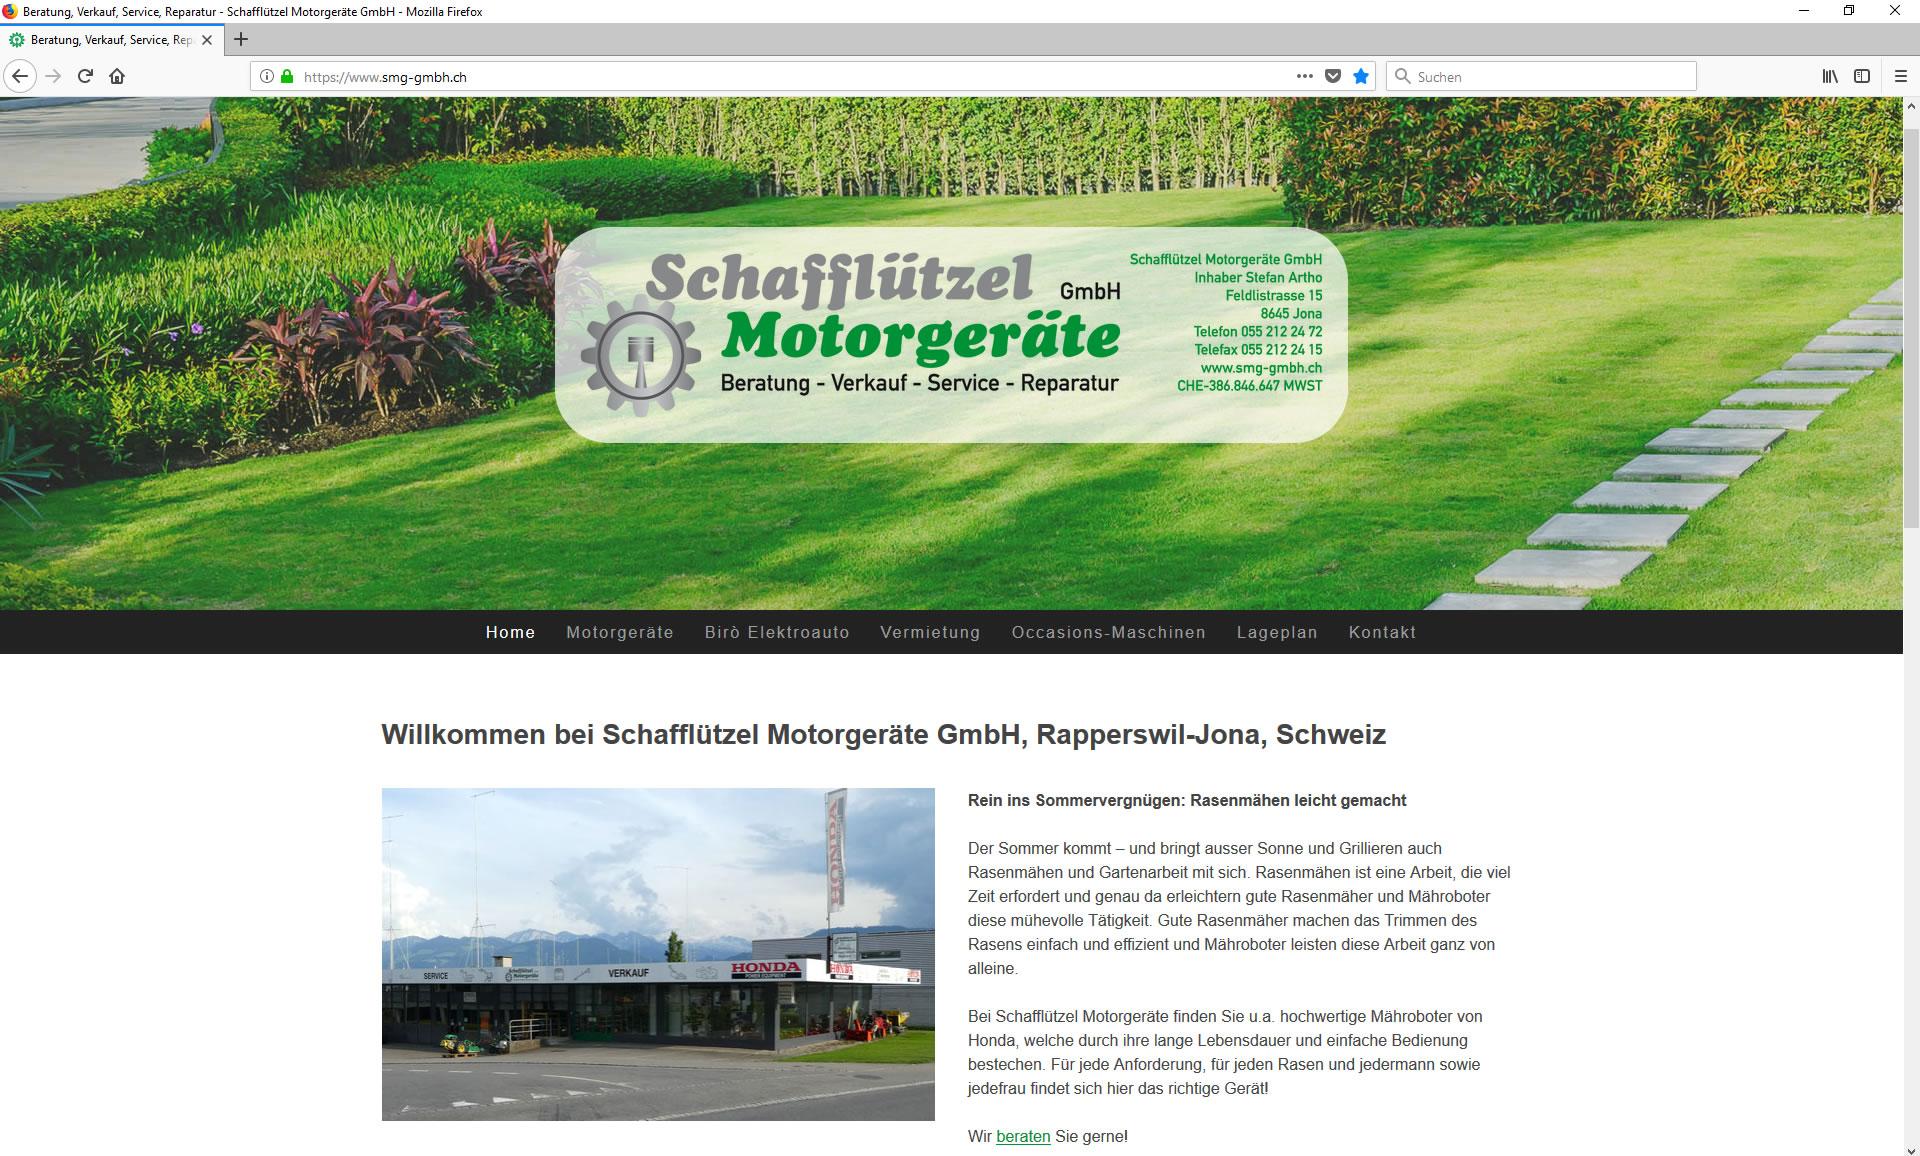 Schafflützel Motorgeräte GmbH, Jona - Inhaber Stefan Artho